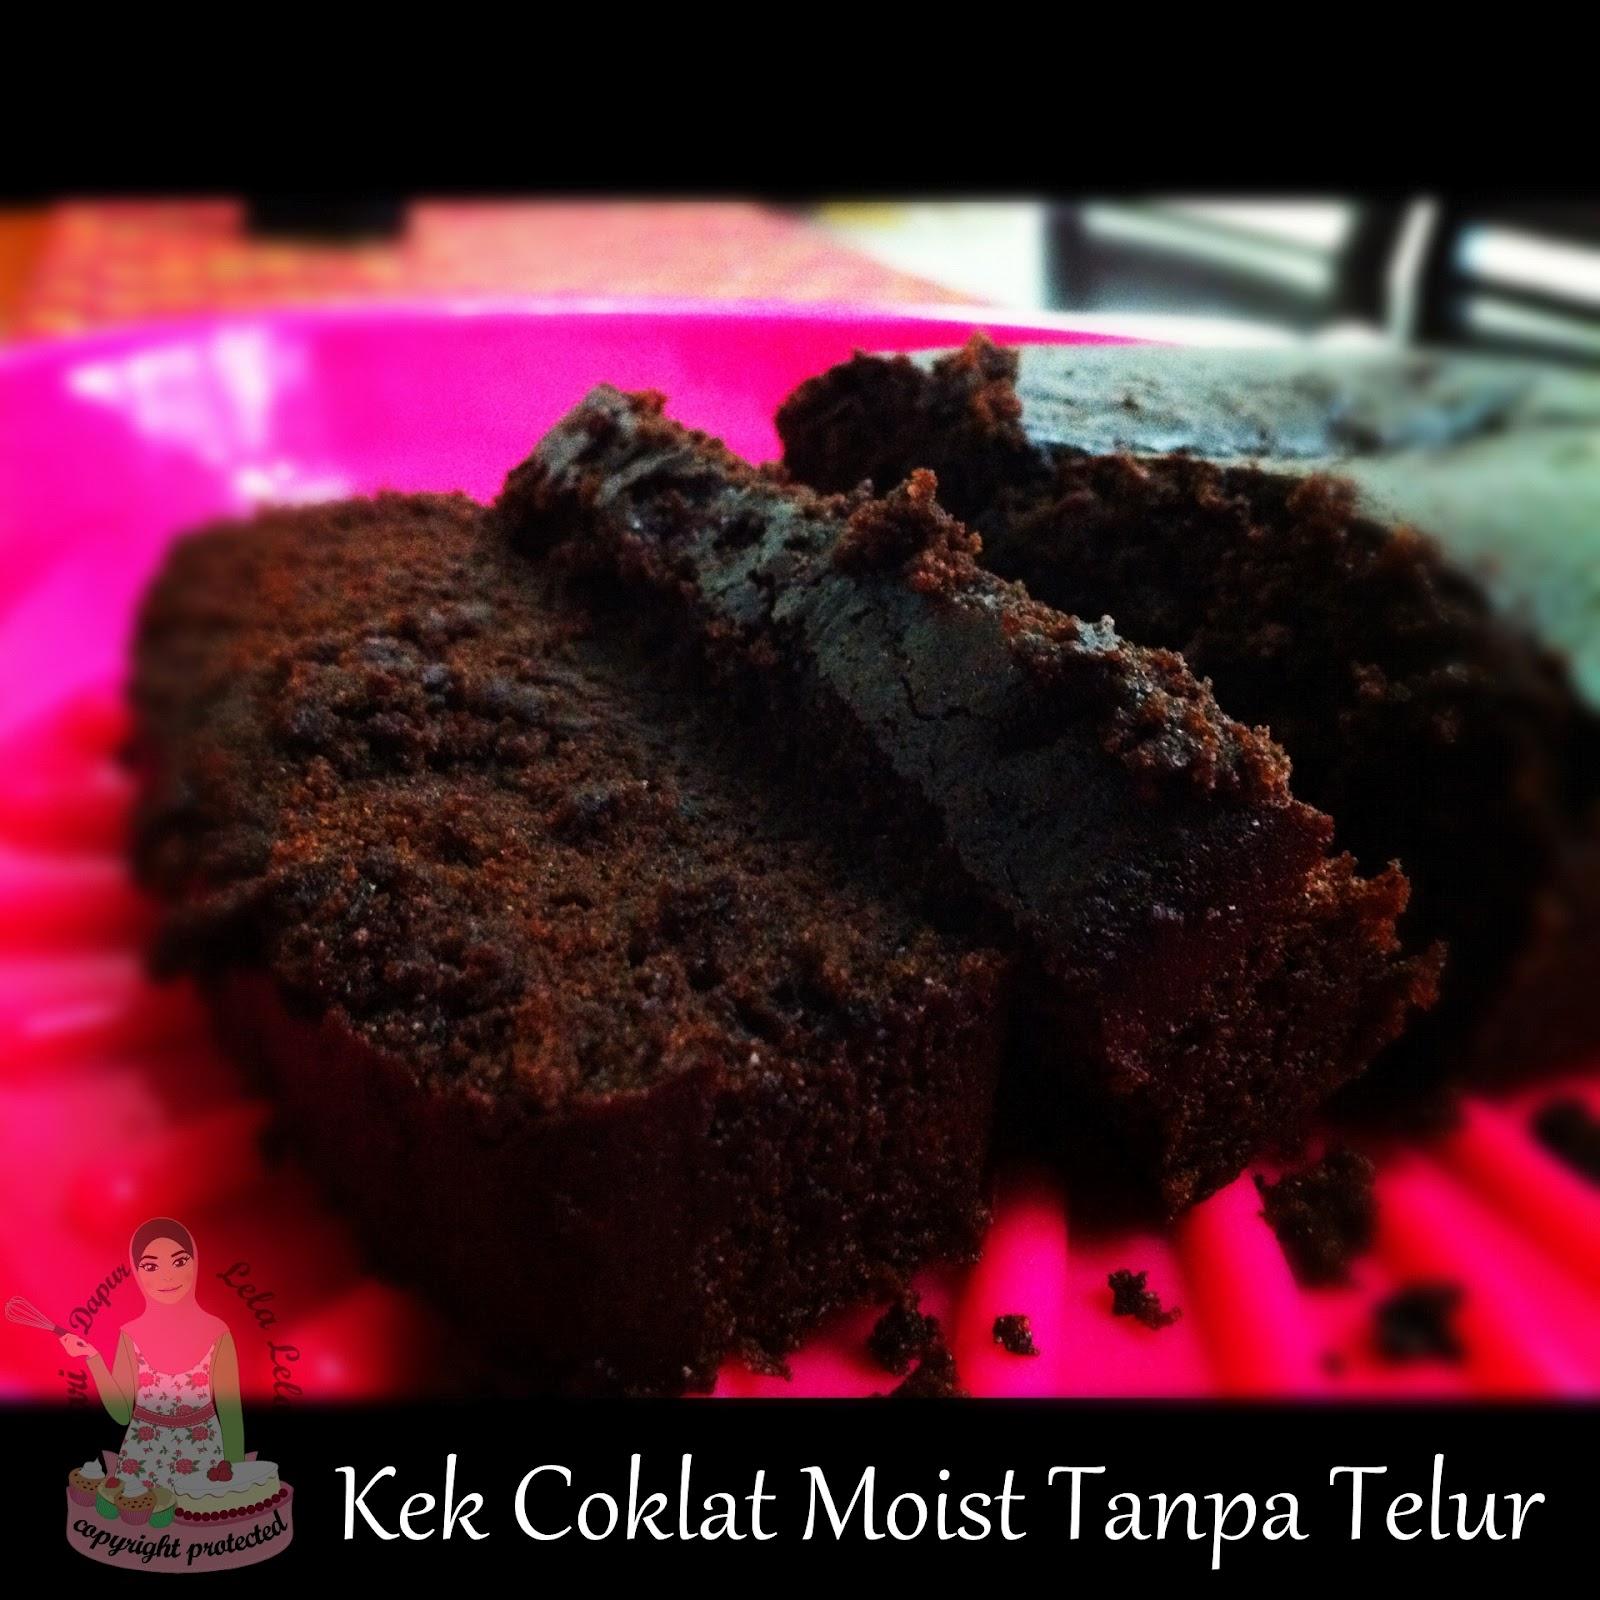 Kek Chocolate Moist Kukus Tanpa Telur